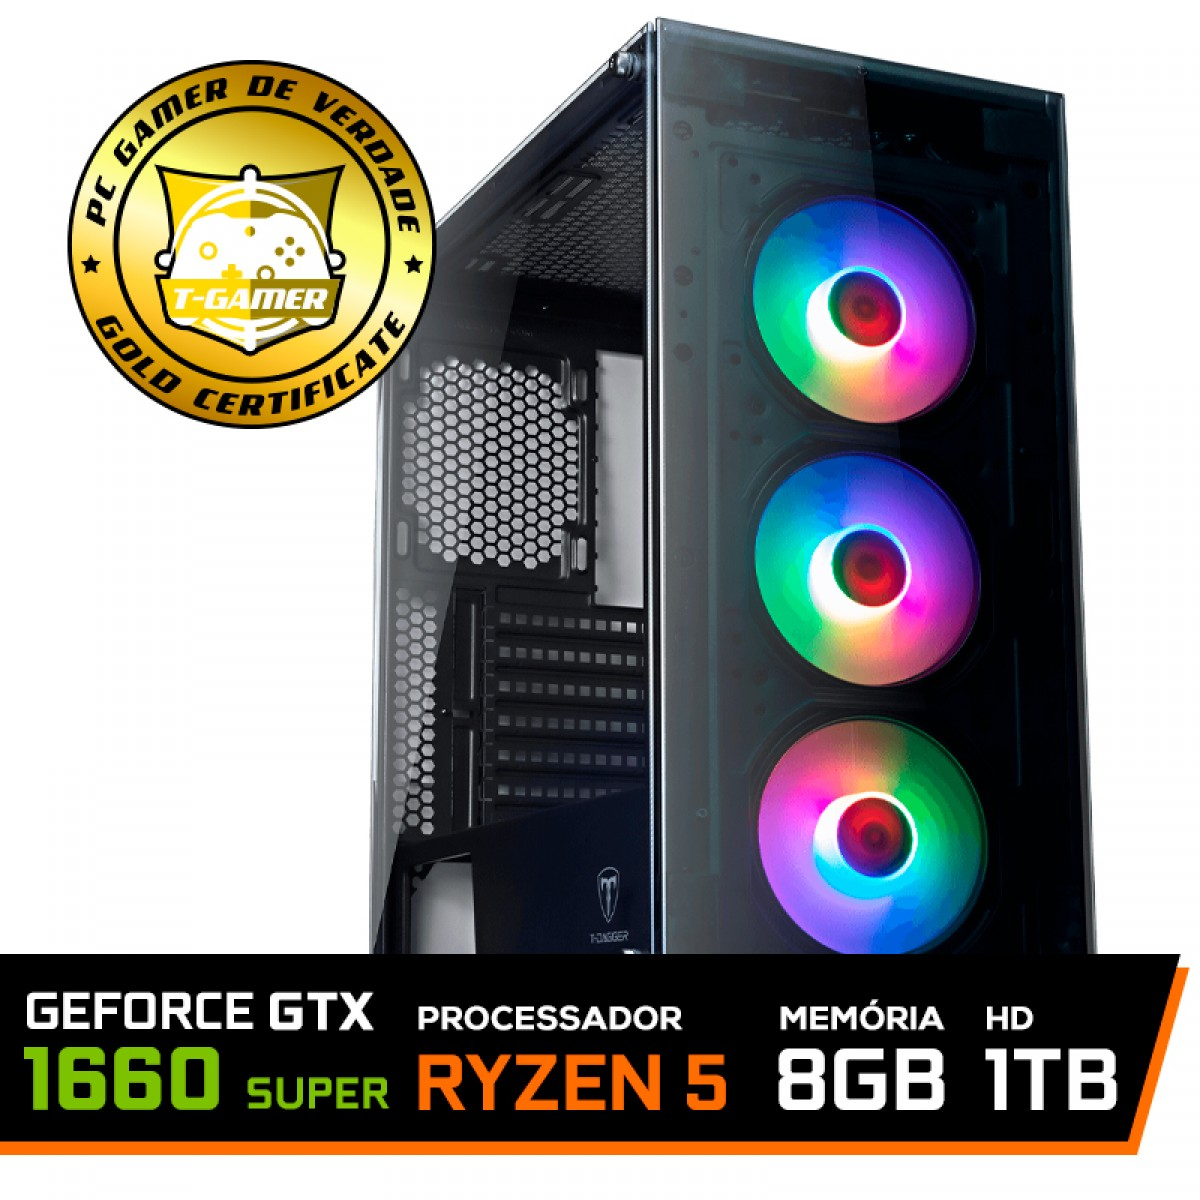 Pc Gamer T-General Lvl-1 Amd Ryzen 5 3600 / GeForce GTX 1660 Super 6GB / DDR4 8GB / HD 1TB / 500W